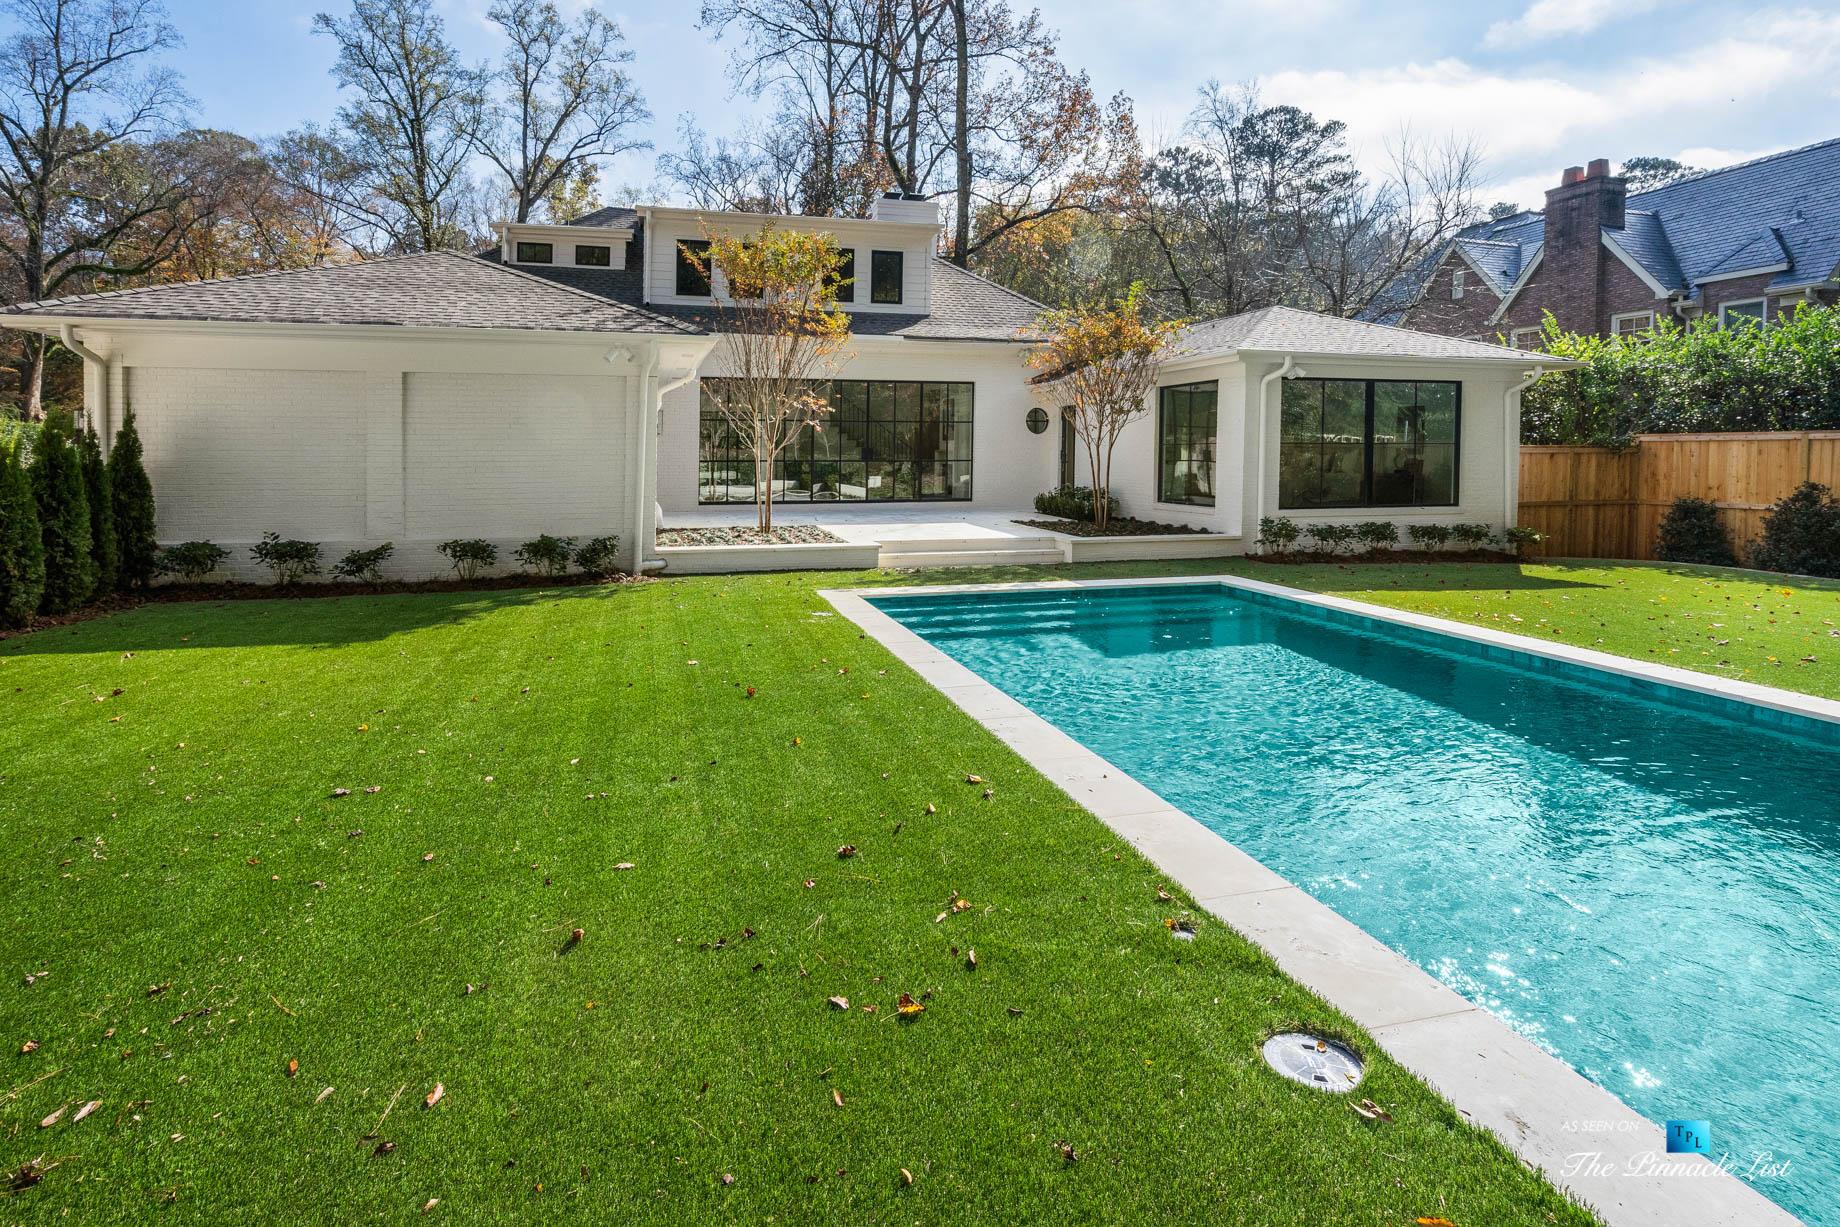 447 Valley Rd NW, Atlanta, GA, USA – Backyard Pool – Luxury Real Estate – Tuxedo Park Home